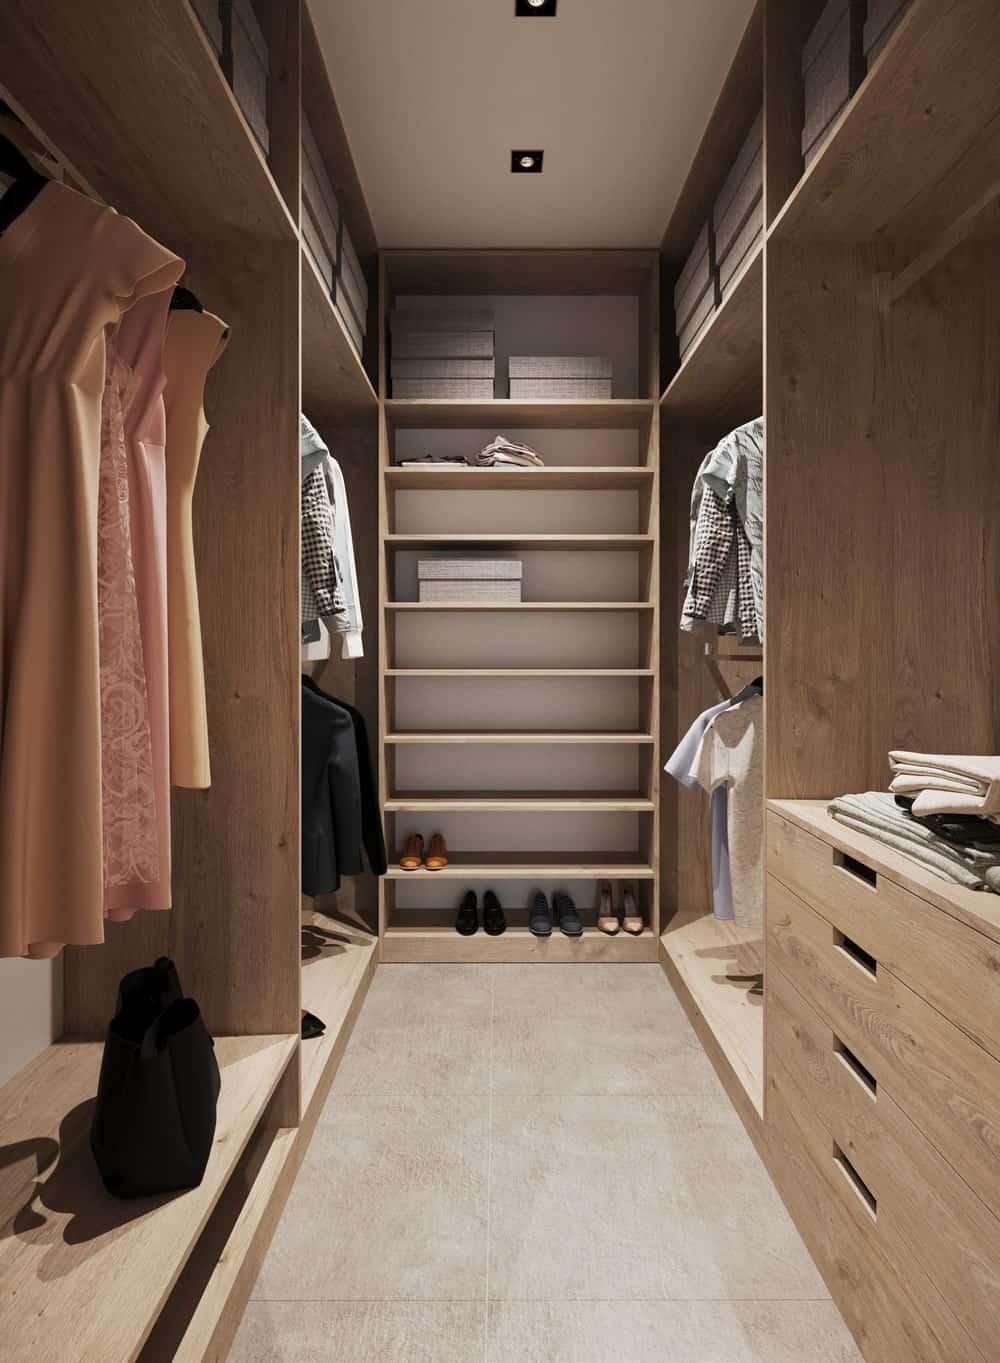 Walk-in closet in the Minimalist Home Interior designed by Johny Mrazko and Studioe.